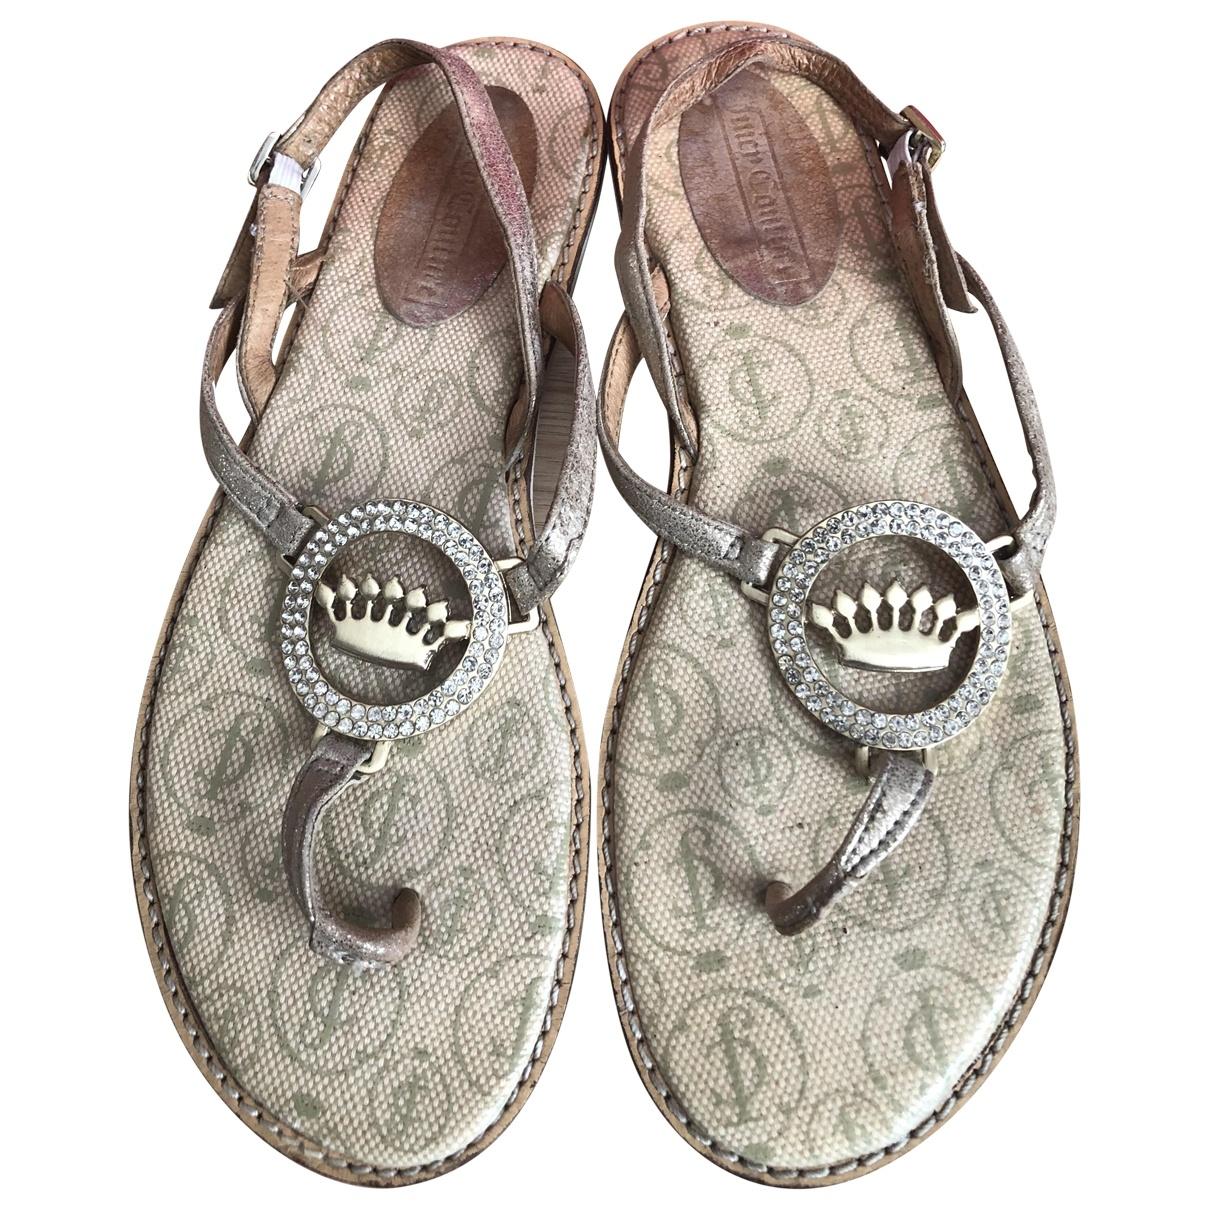 Juicy Couture \N Metallic Cloth Sandals for Women 38 EU